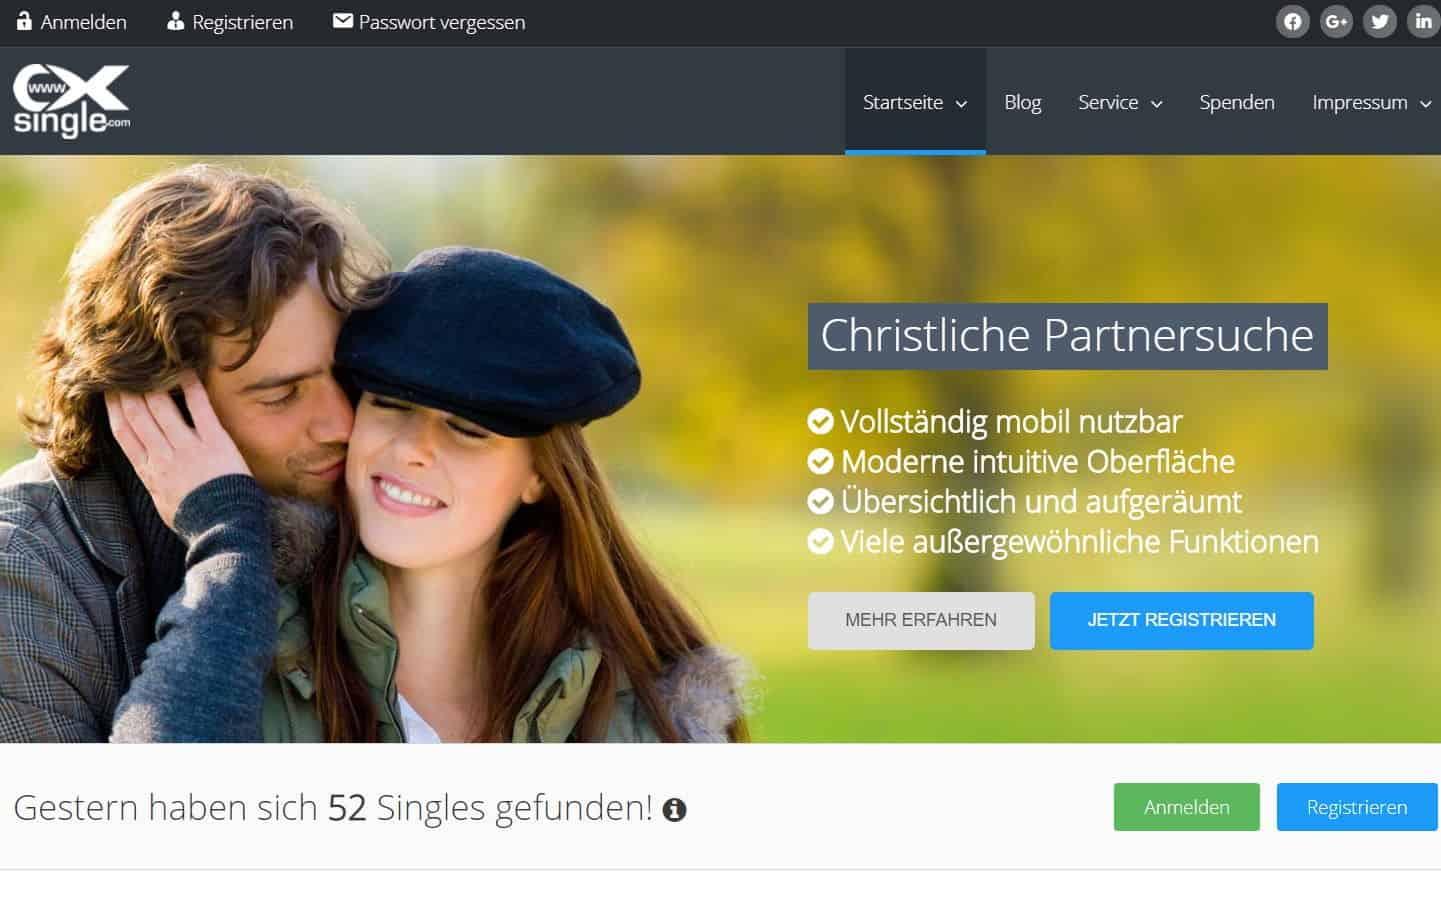 CXSingle.com - Startseite